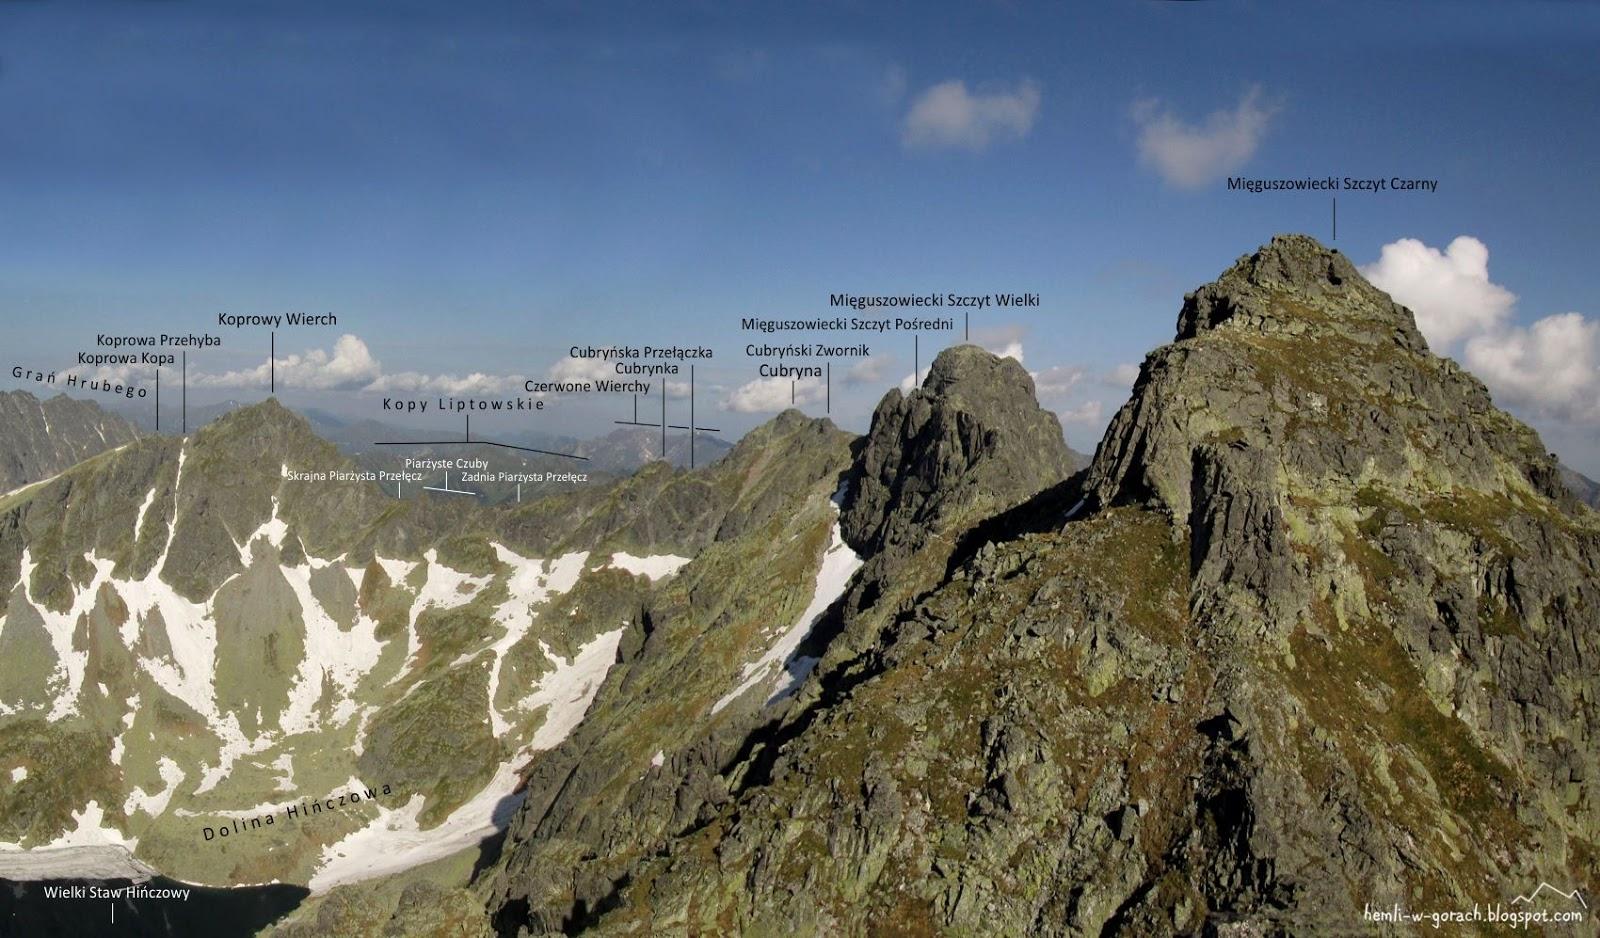 panorama z Hińczowej Turni